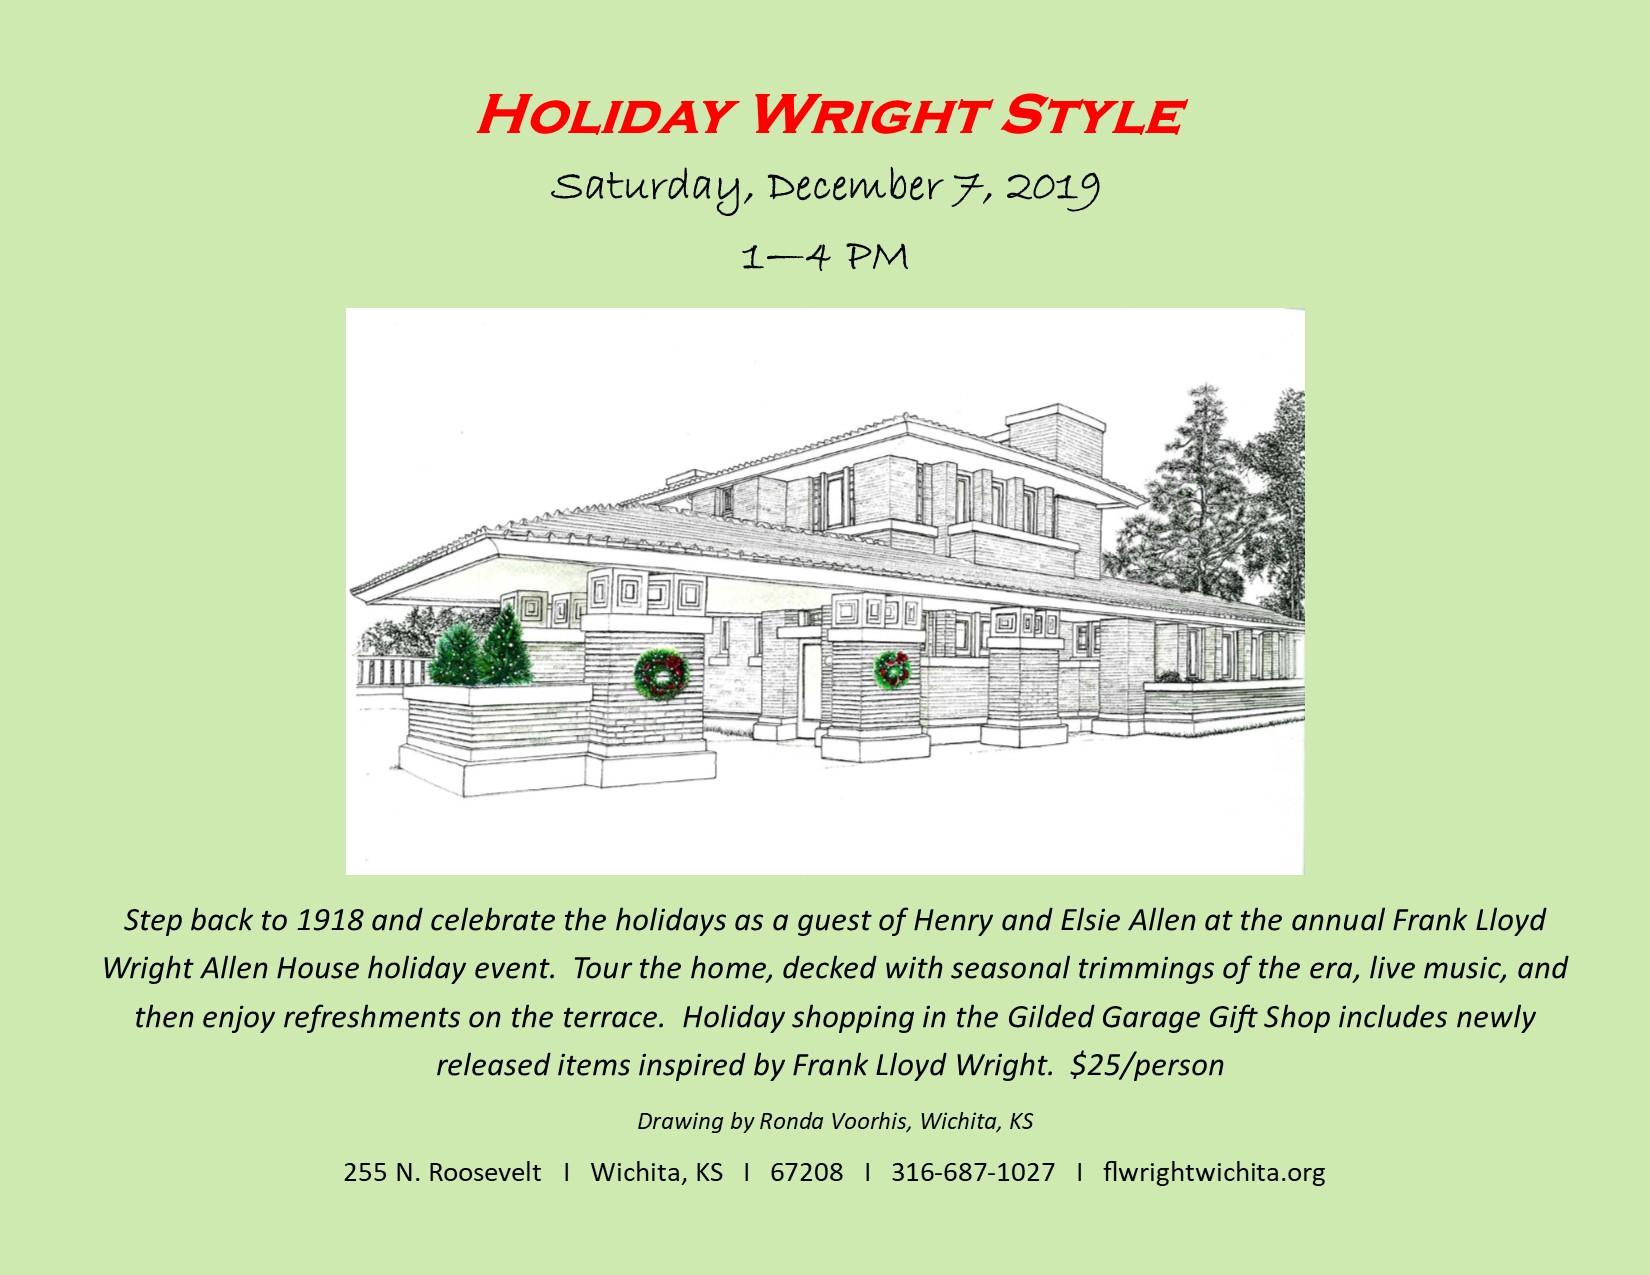 Holiday-Wright-Style-2019